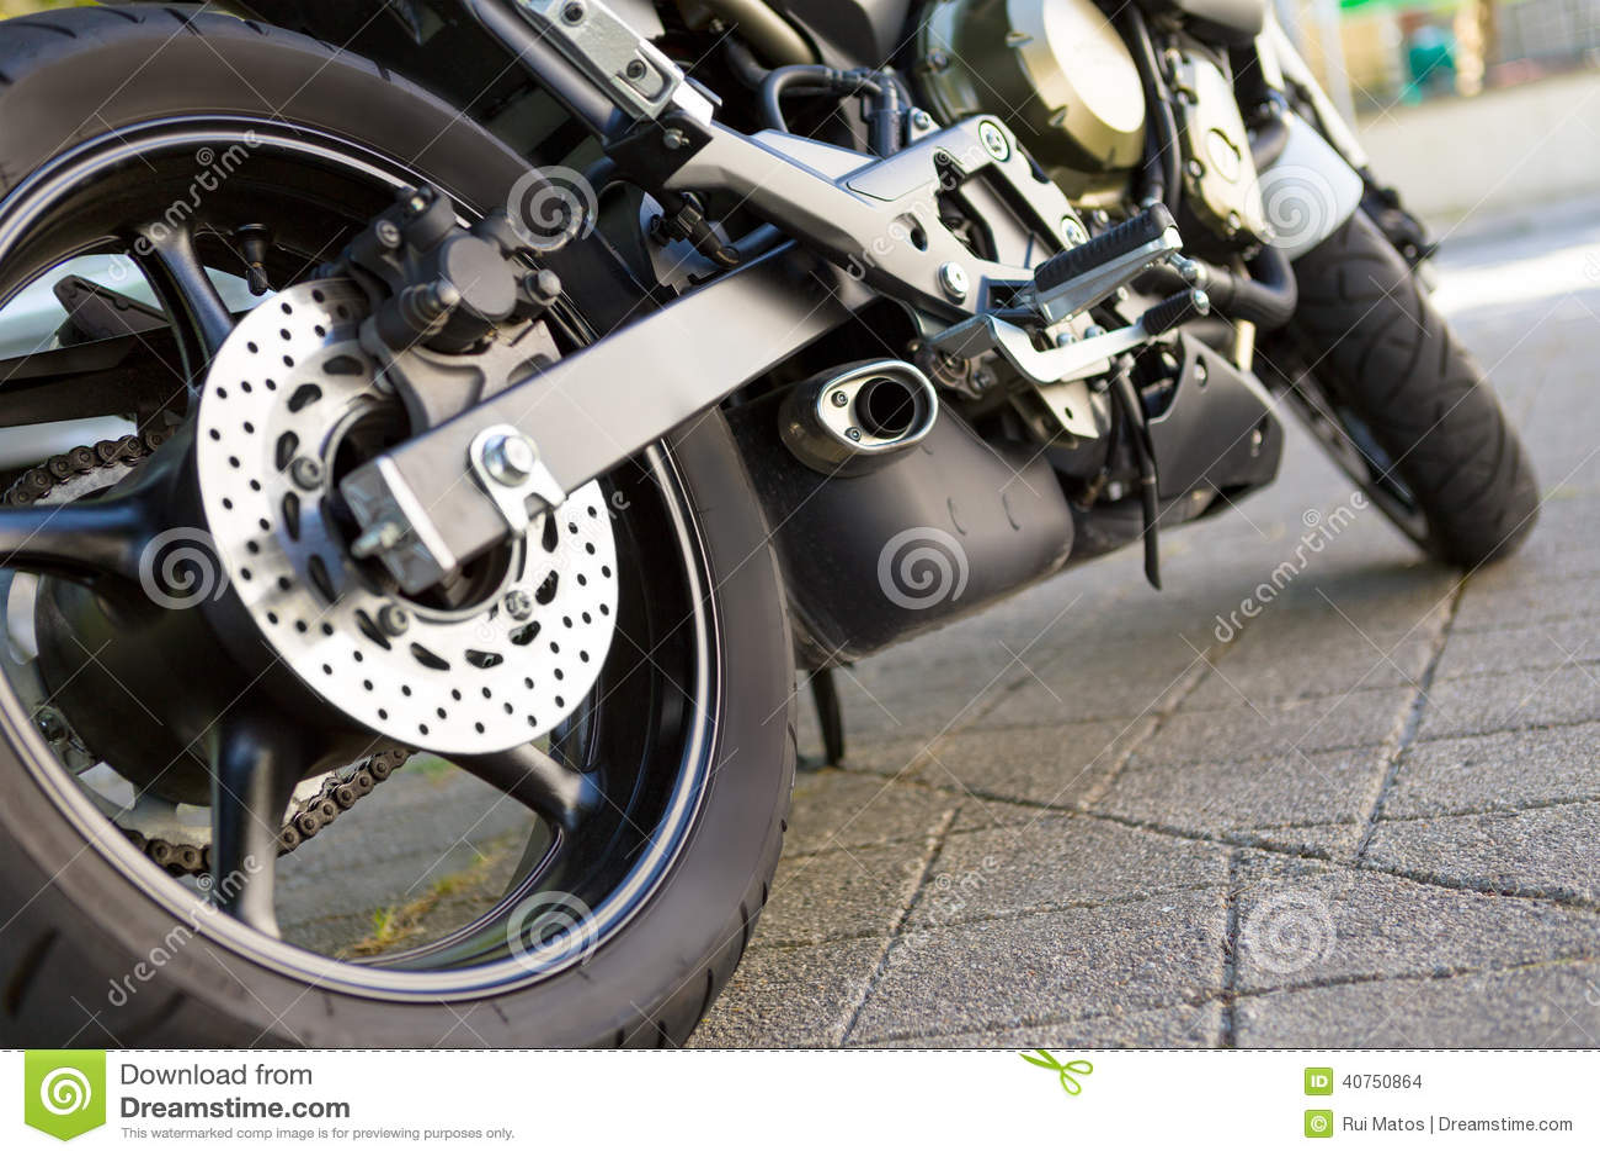 Download Motorcycle stock photo. Image of mechanical, engine, mechanics - 40750864